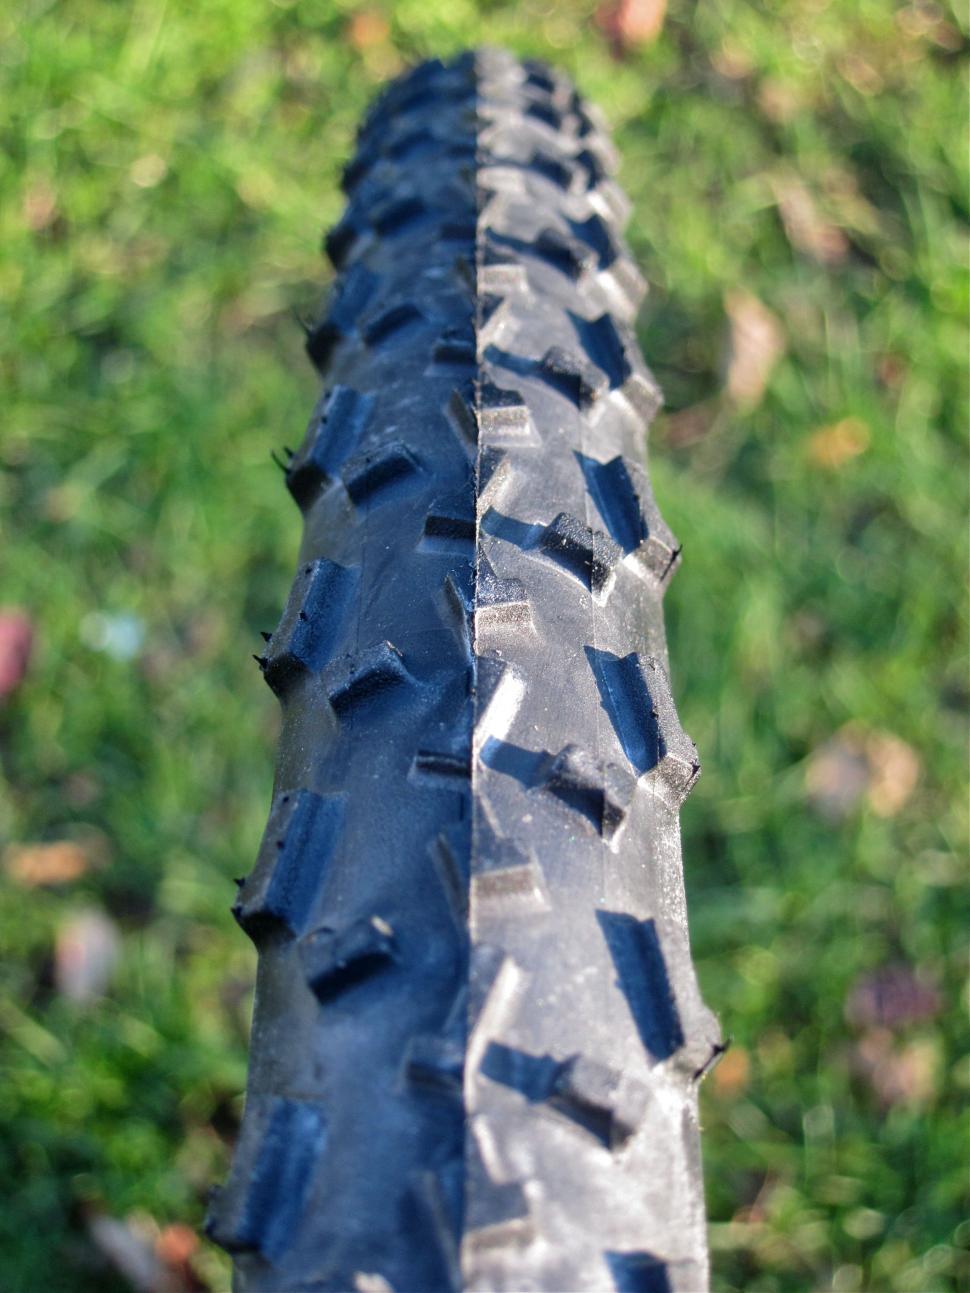 Islabikes Greim Pro cyclo-cross tyre 700 x 32c - Tread On.jpg